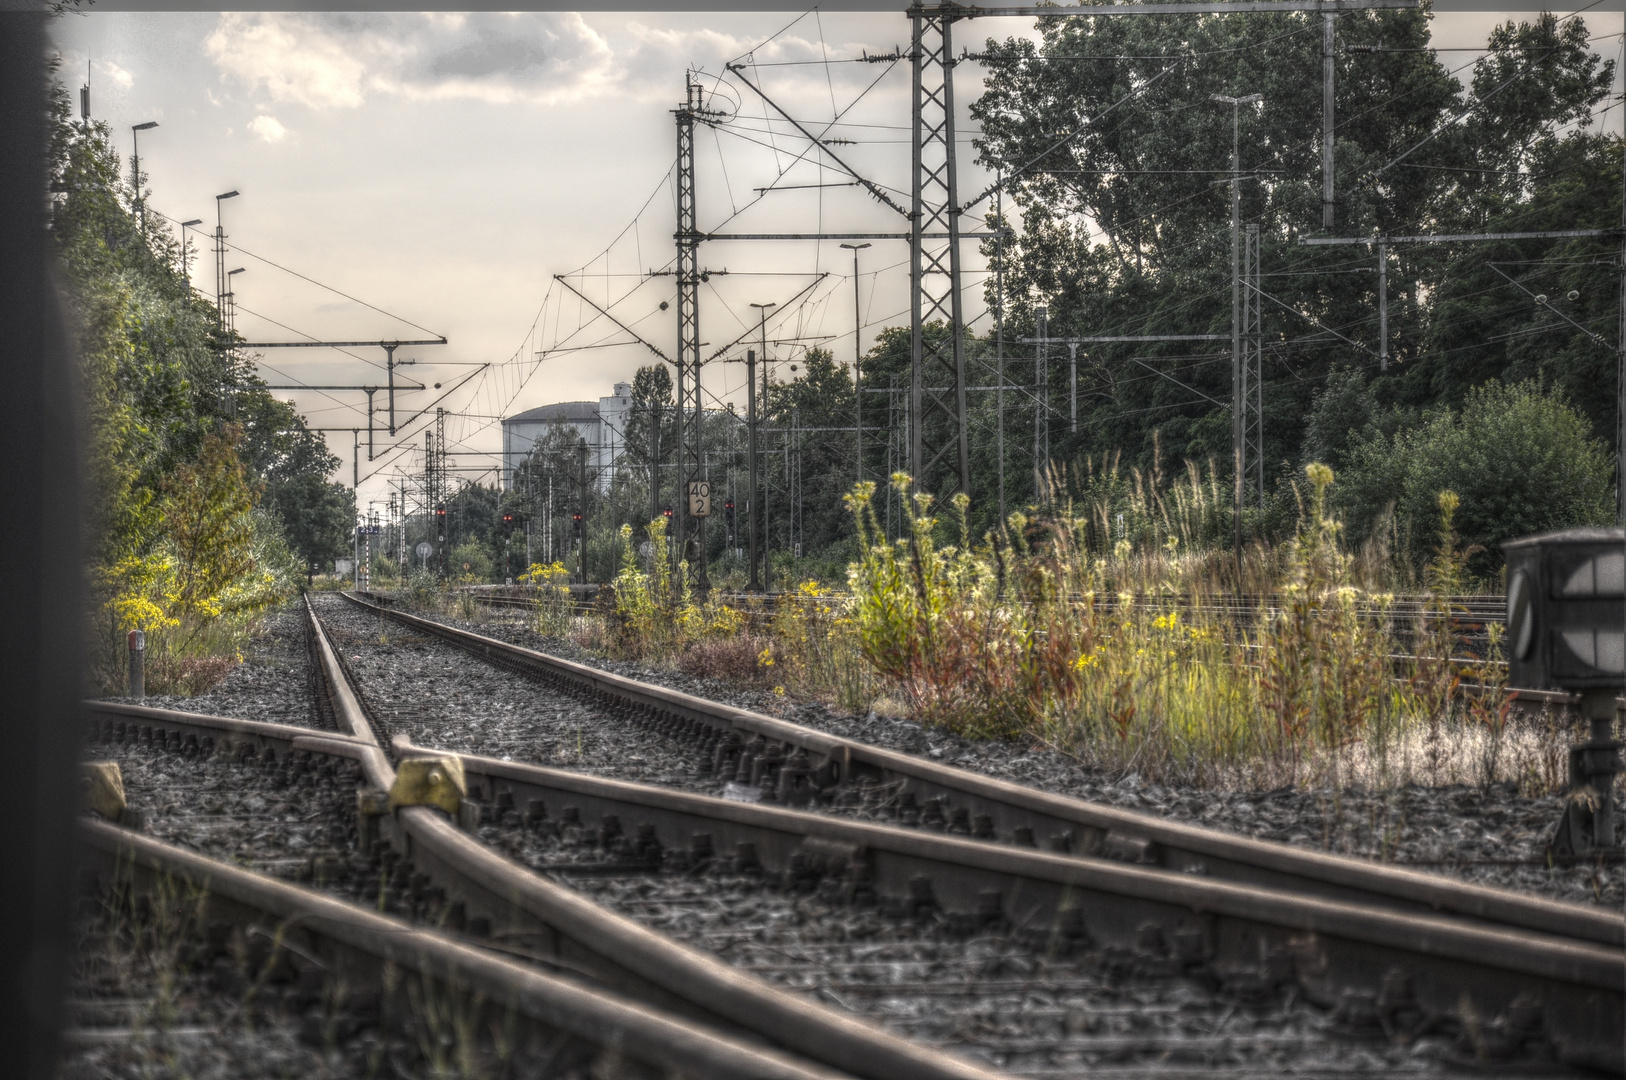 Stilleben am Bahngleis